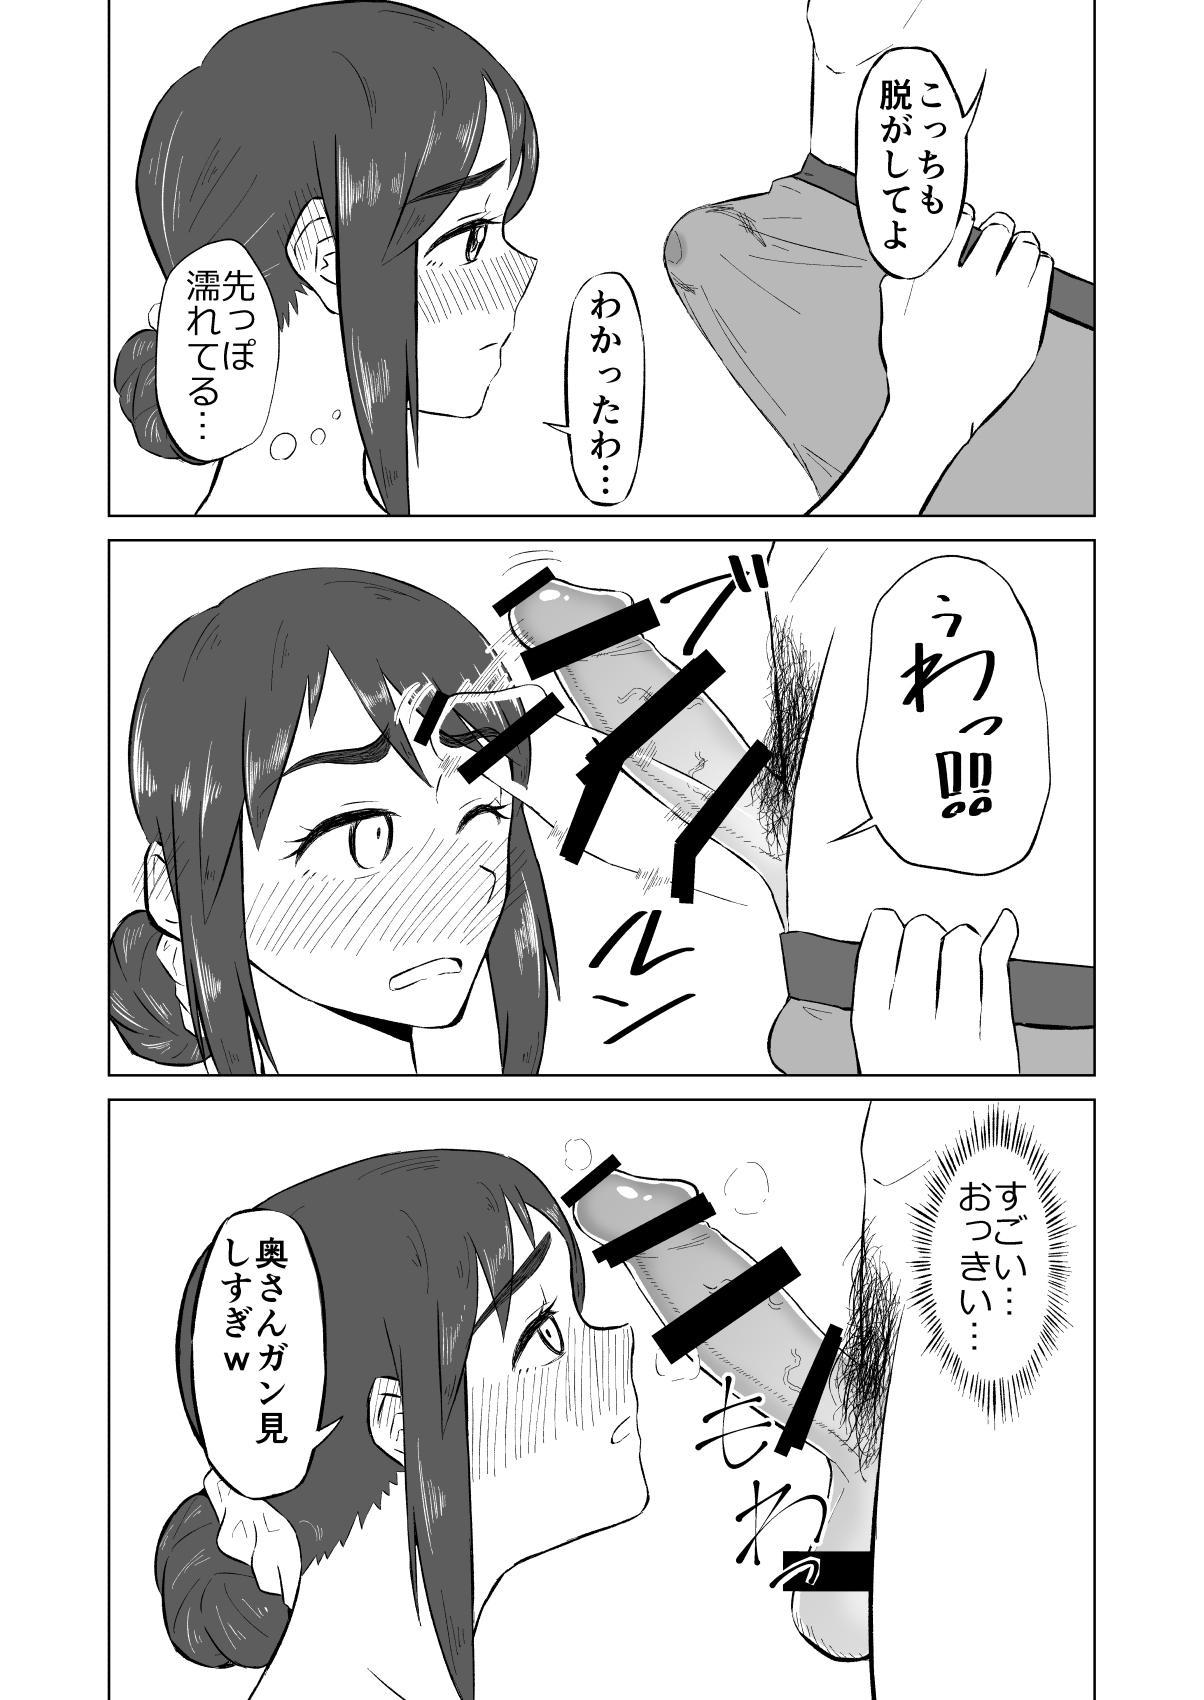 Hitozuma ga Off-kai de Omochikaerare Hon 9